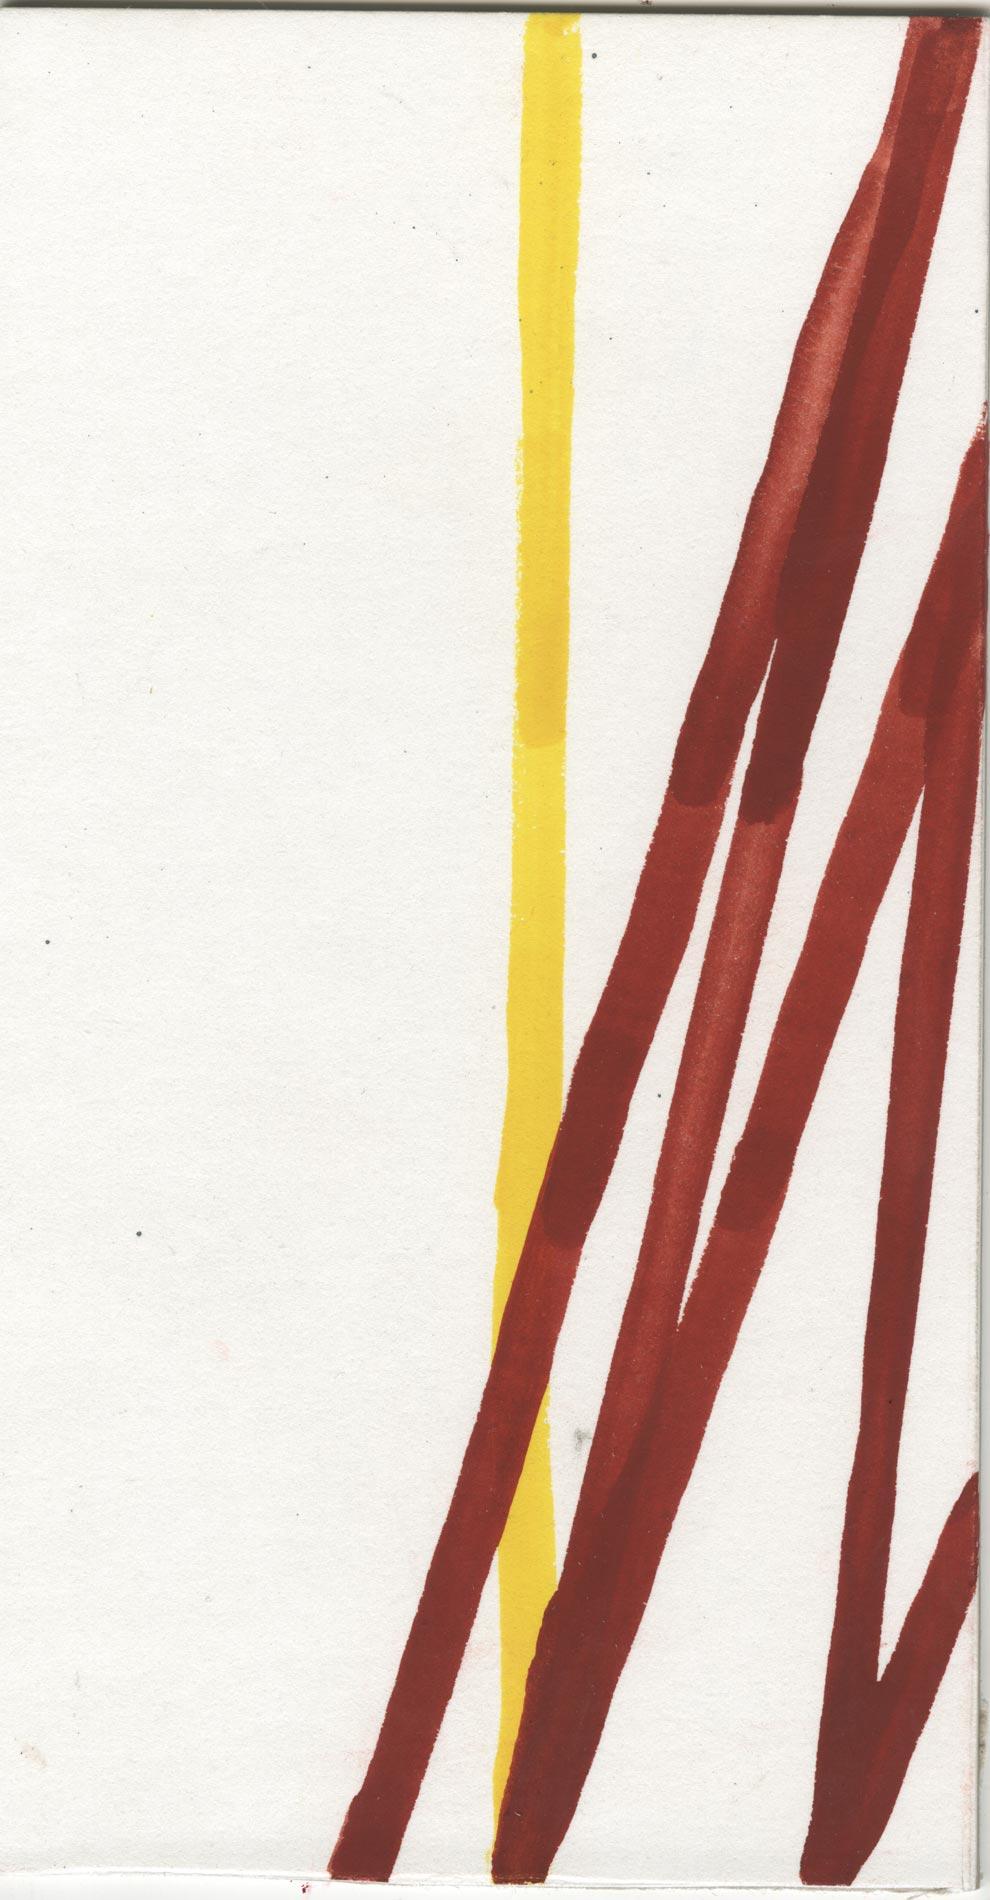 zig-zag-rust-yellow.jpg